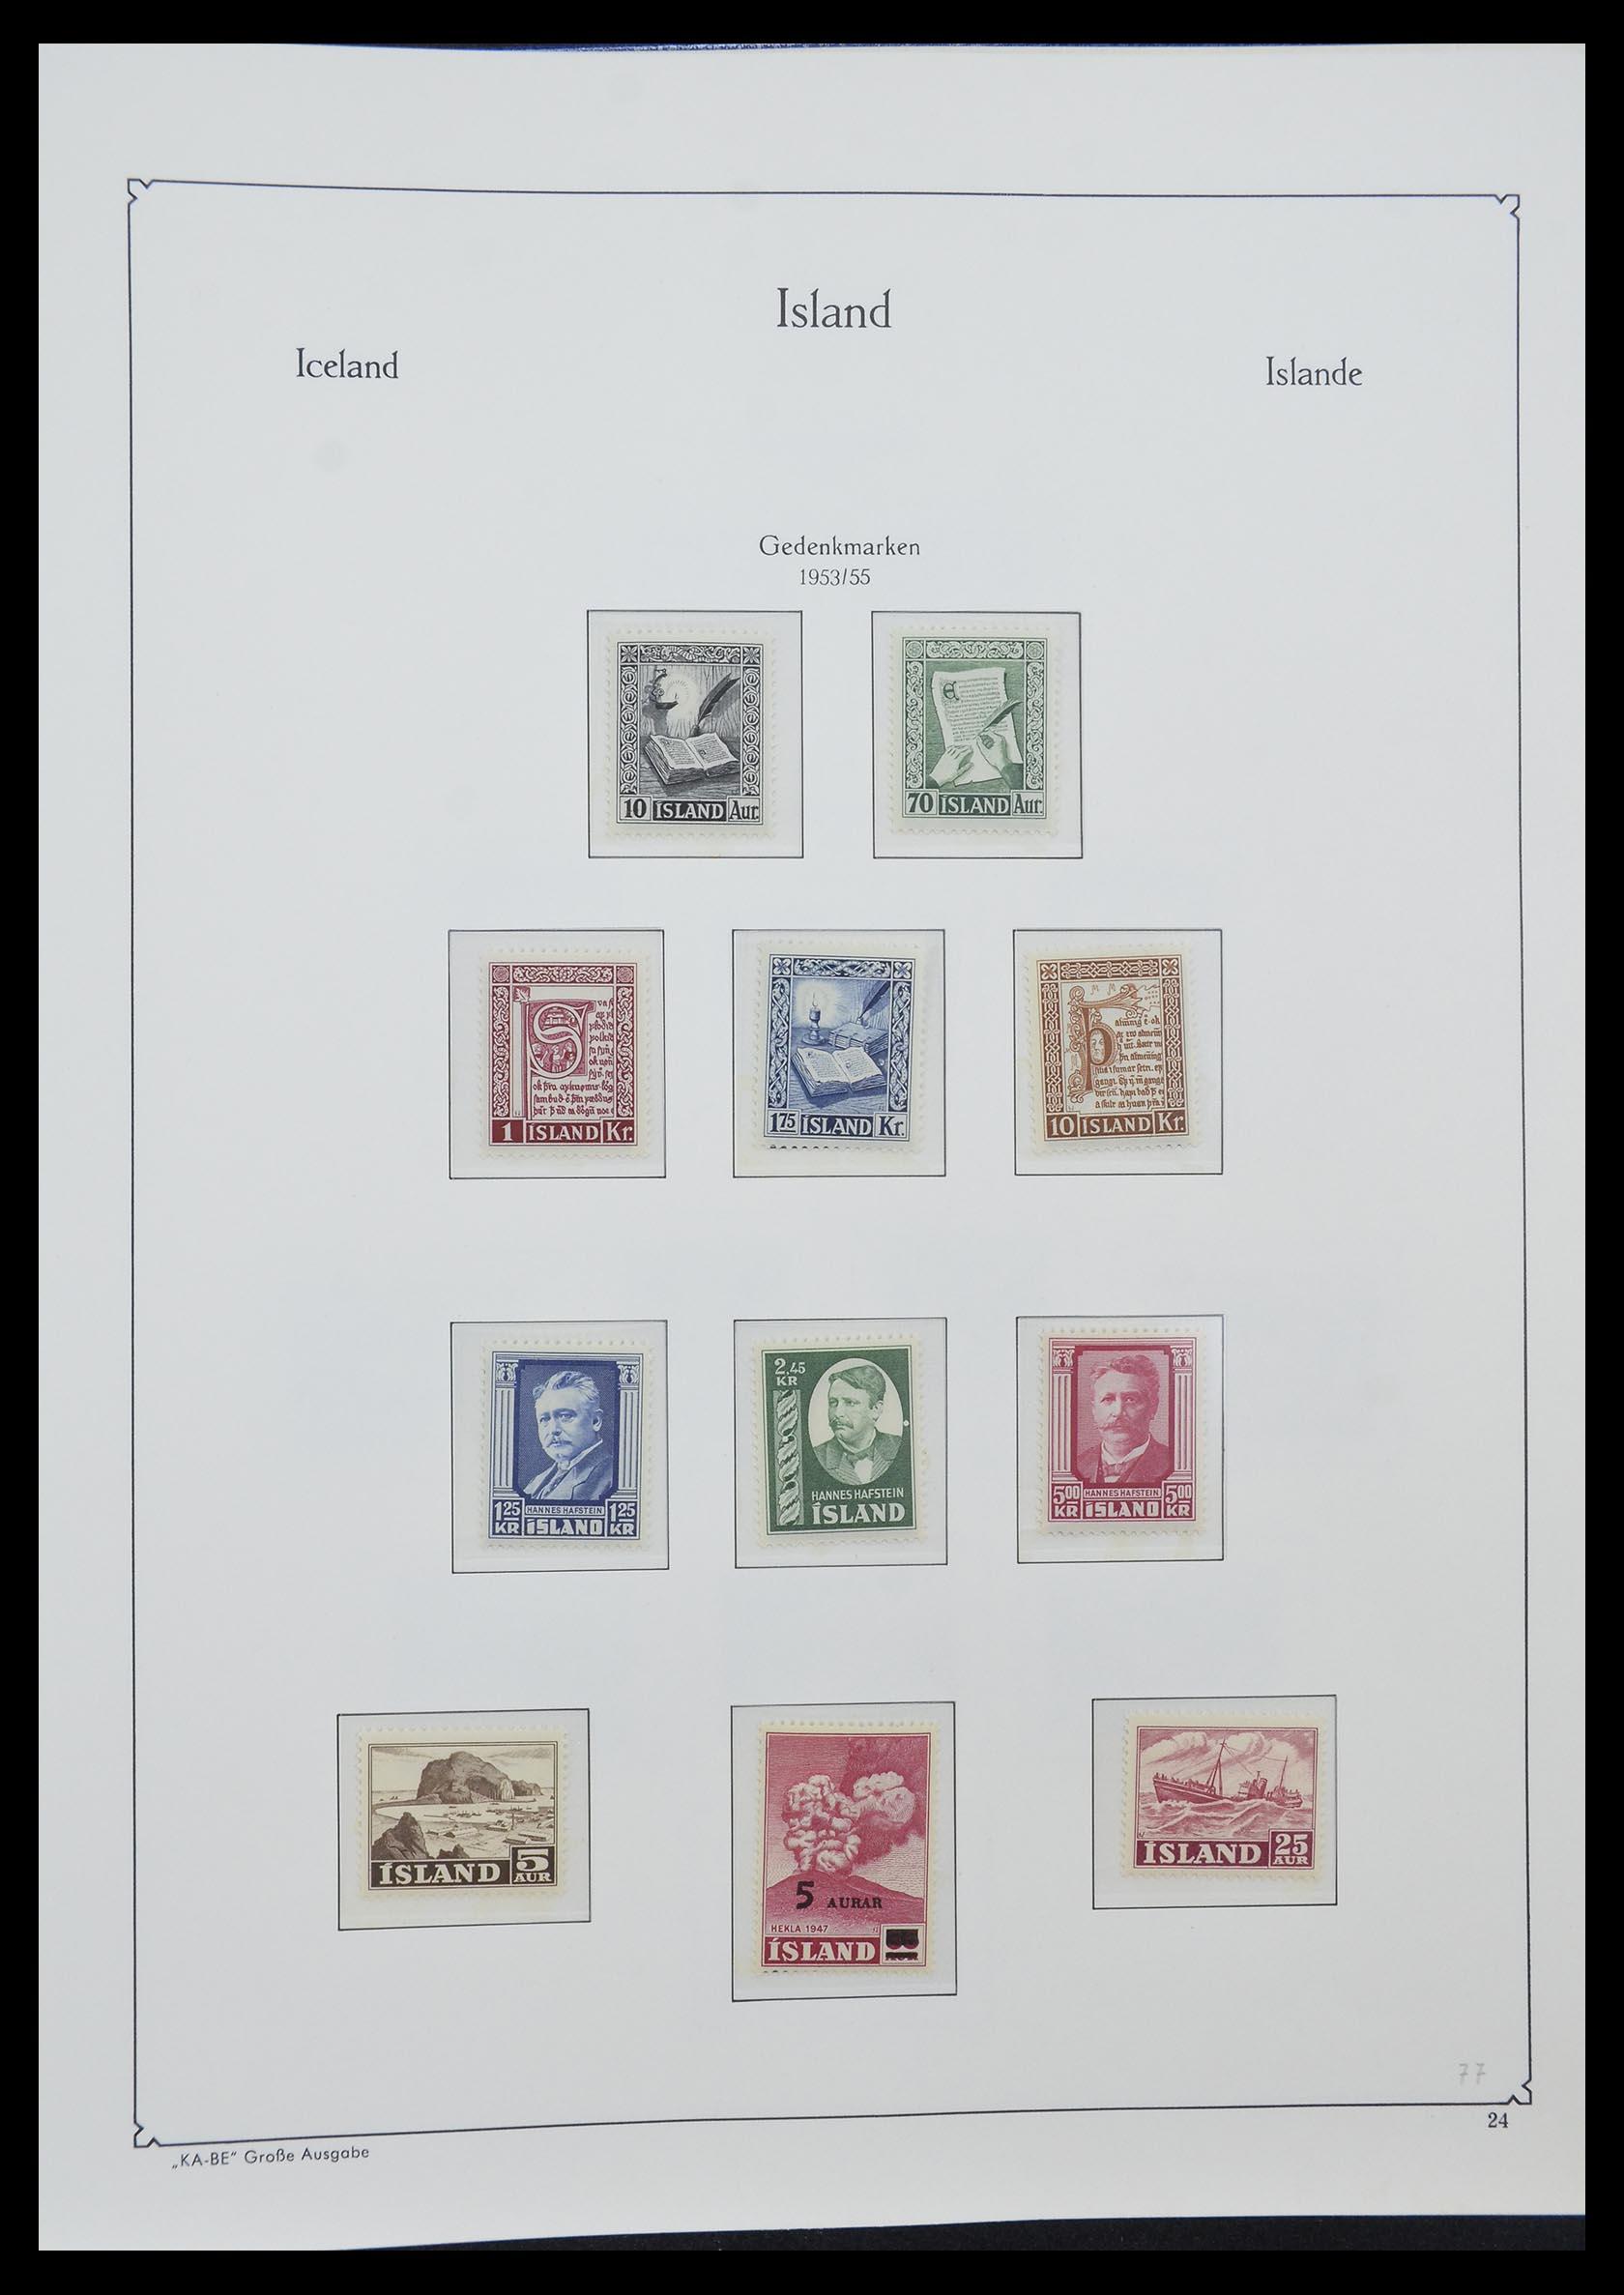 33185 007 - Postzegelverzameling 33184 Finland 1856-1990.